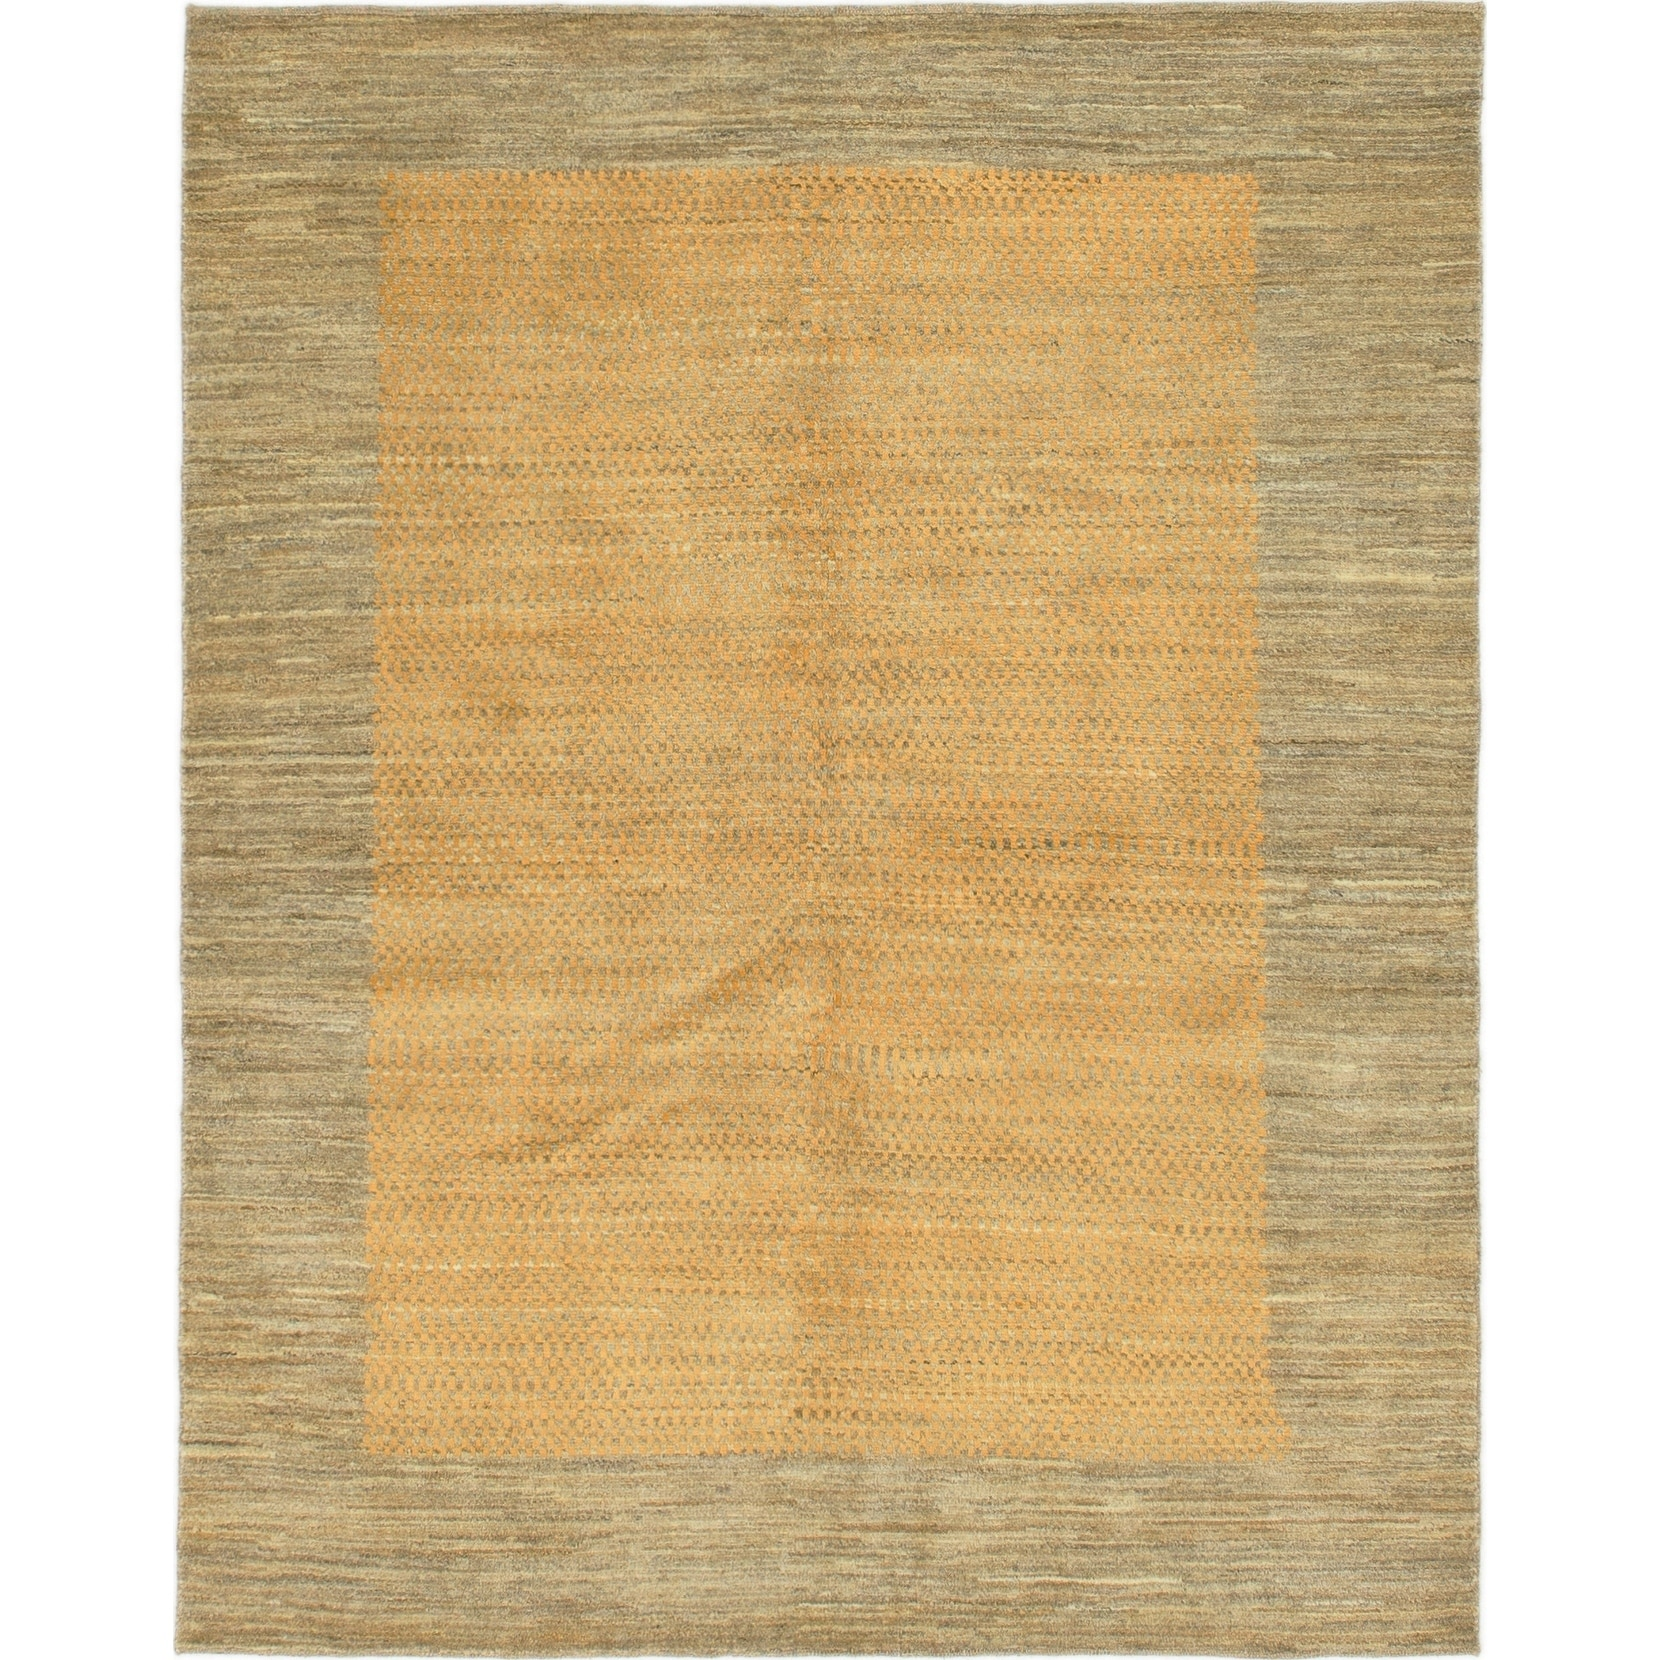 Hand Knotted Kashkuli Gabbeh Wool Area Rug - 5 x 6 3 (Gold - 5 x 6 3)